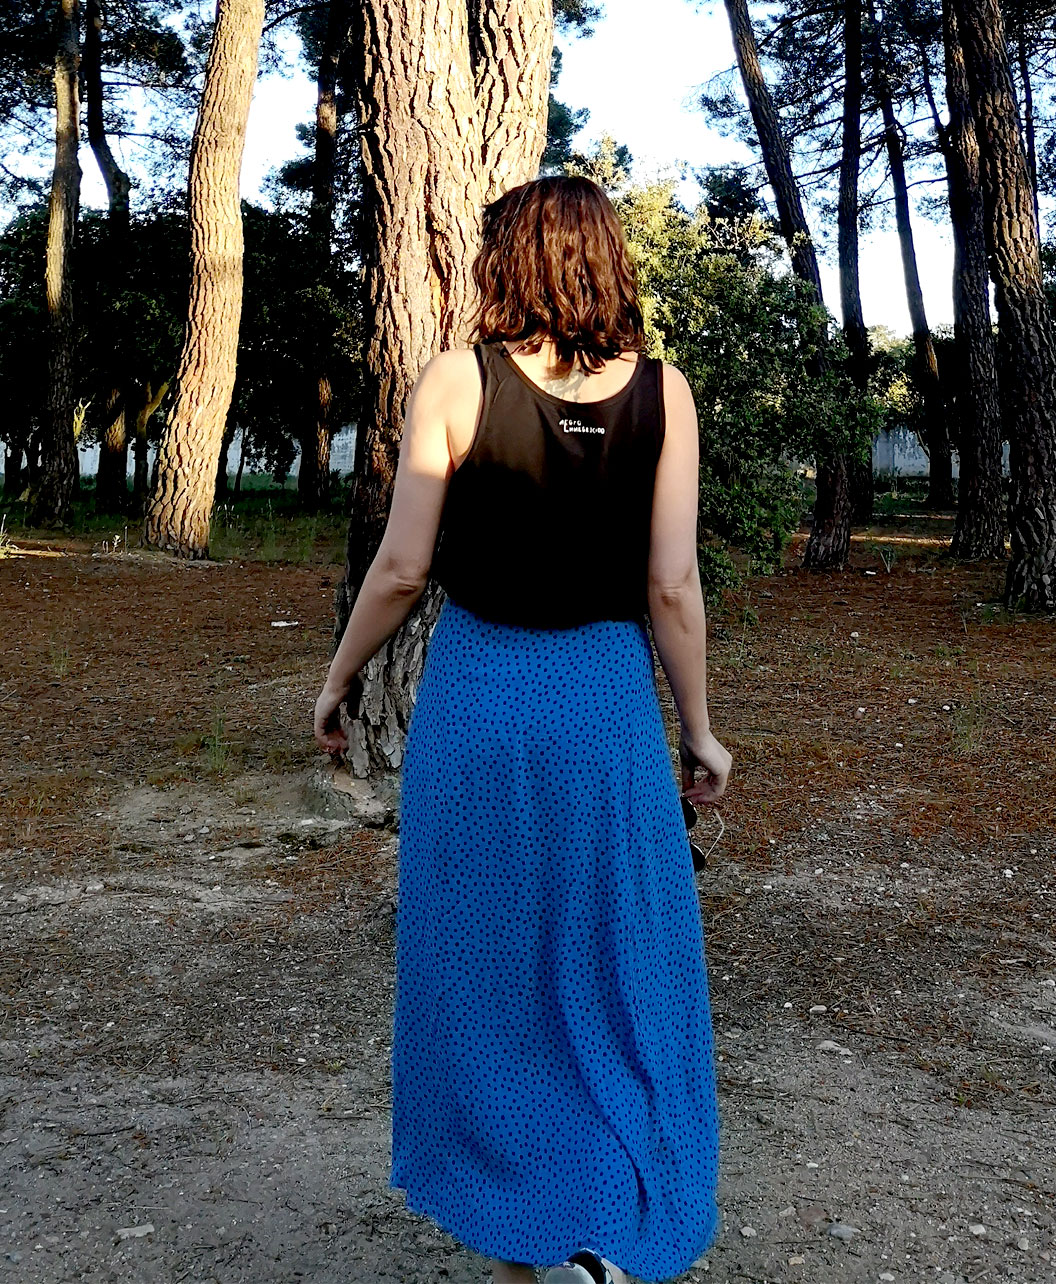 camiseta diferente con ilustracion de mujer tirantes algodon organico ojo arcoiris